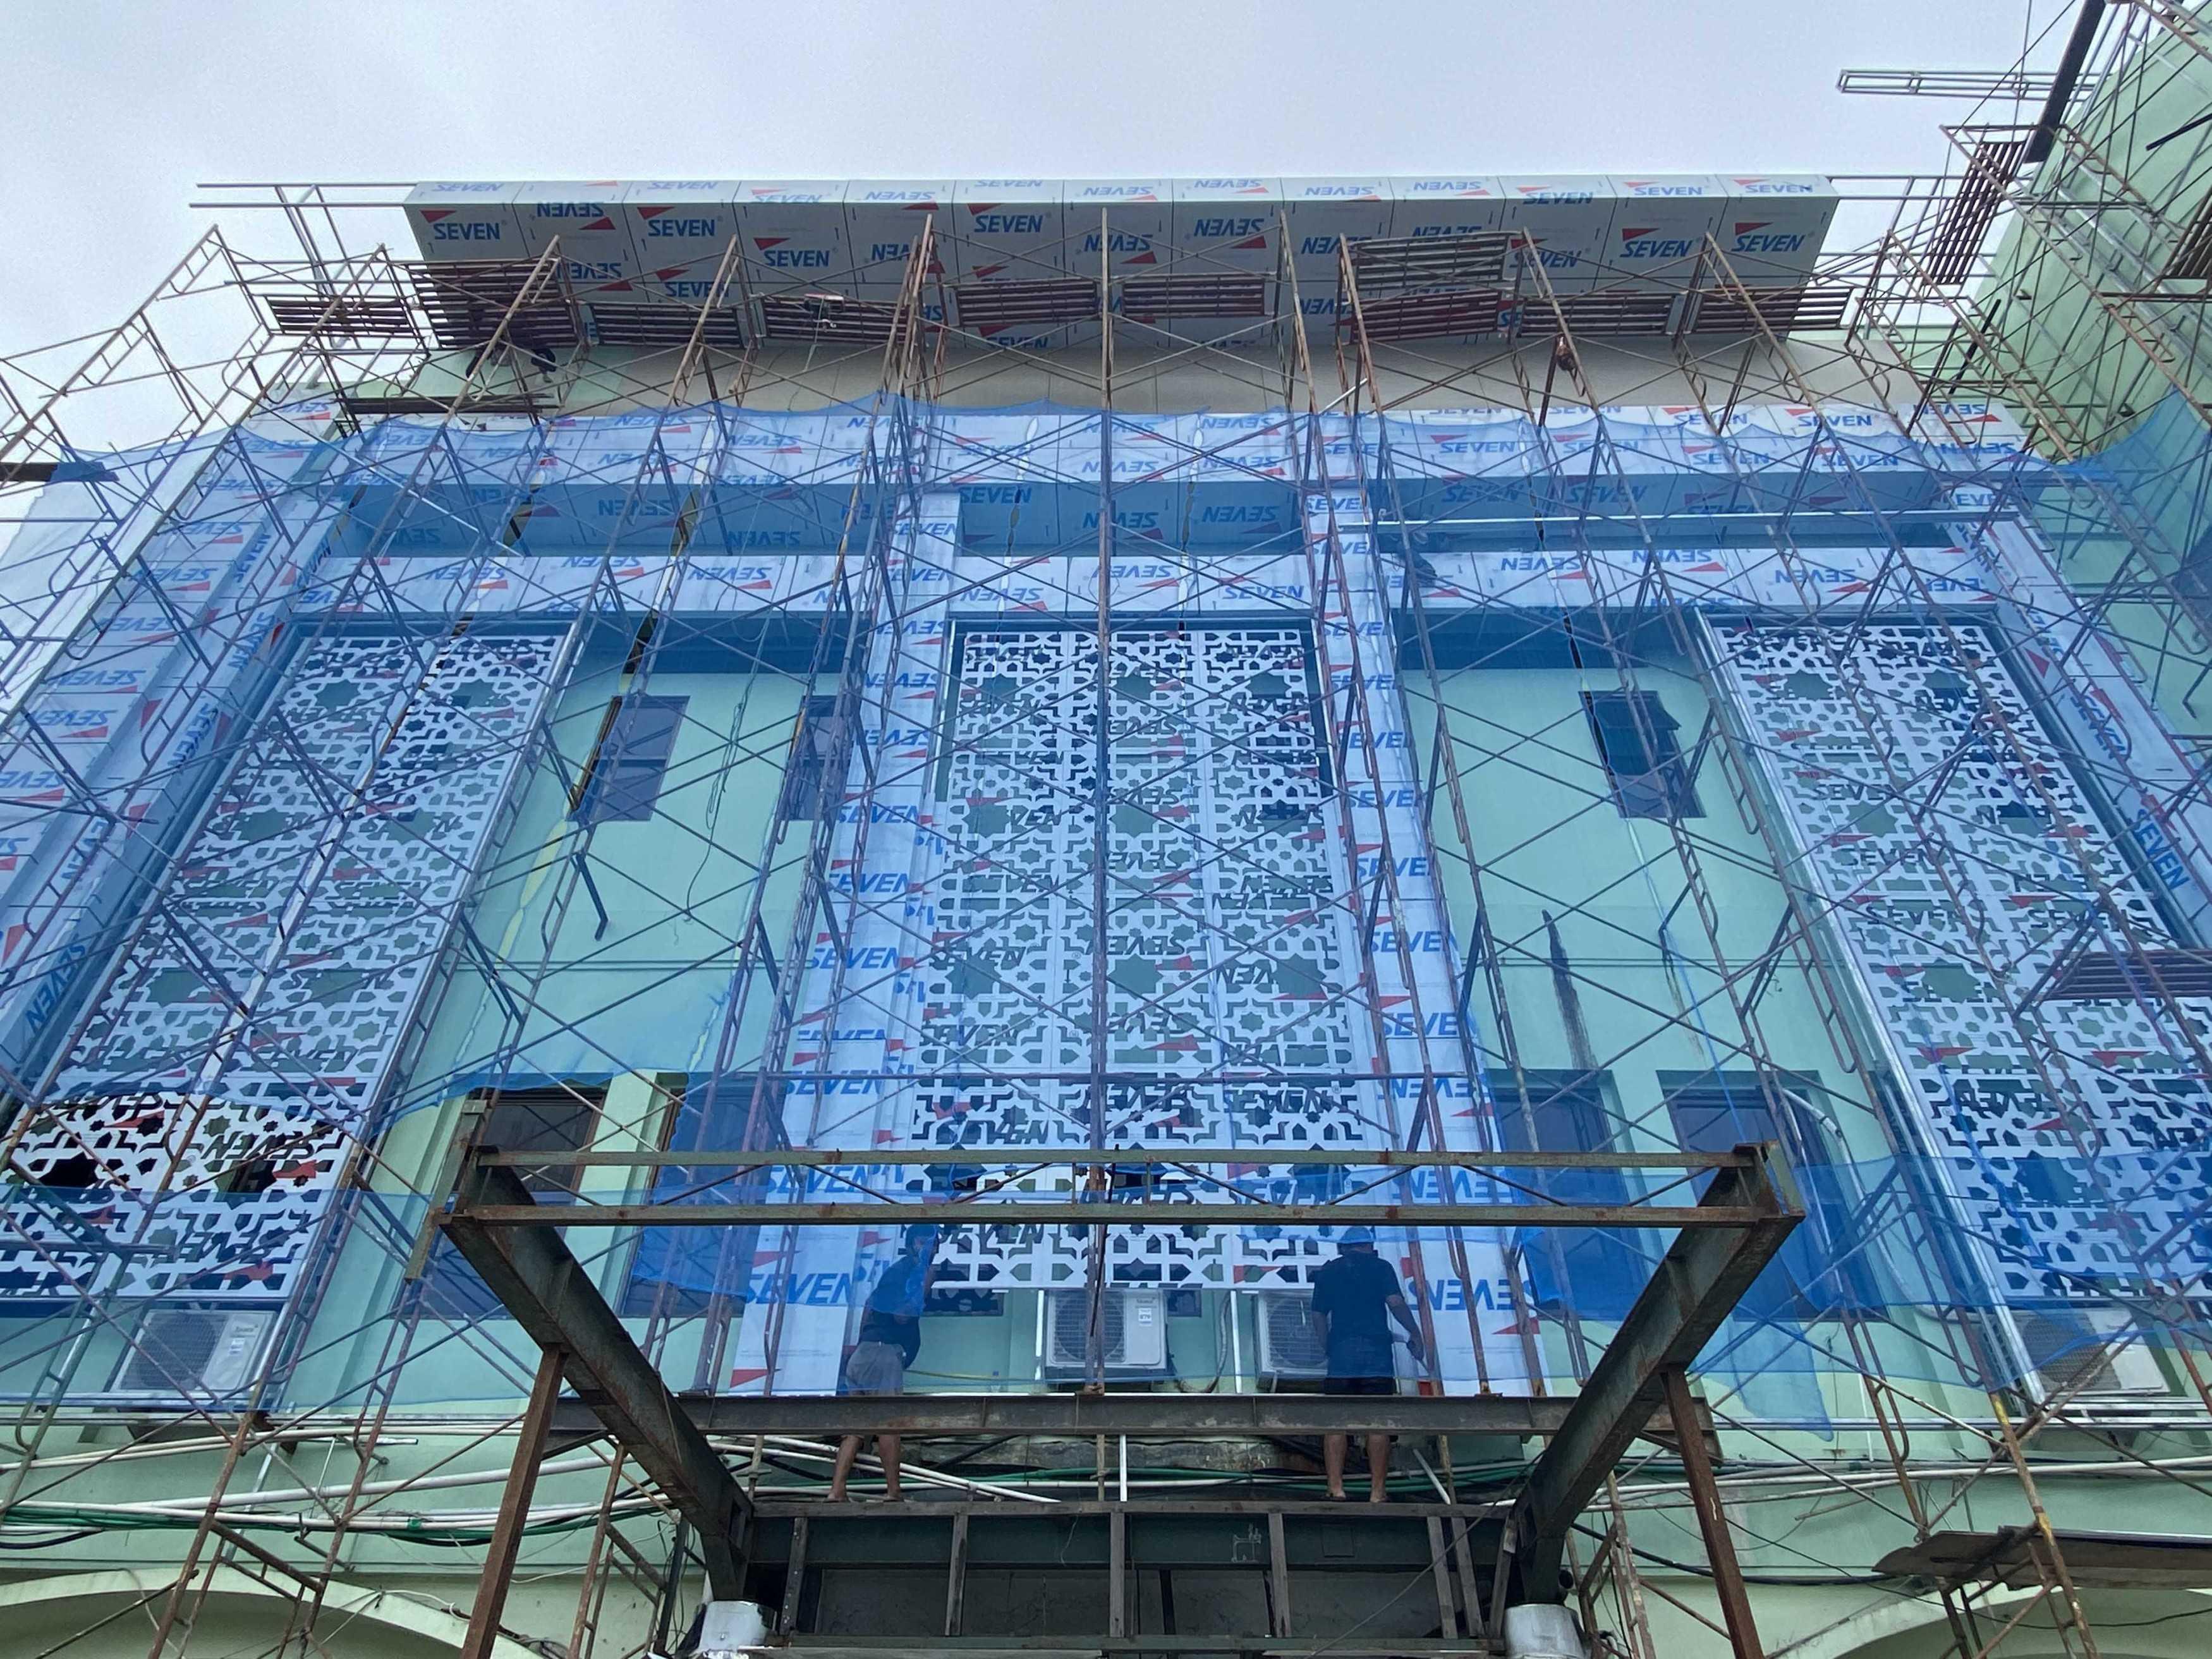 iap-architect-pku-bantul-renovasi-fasad1615972833-l